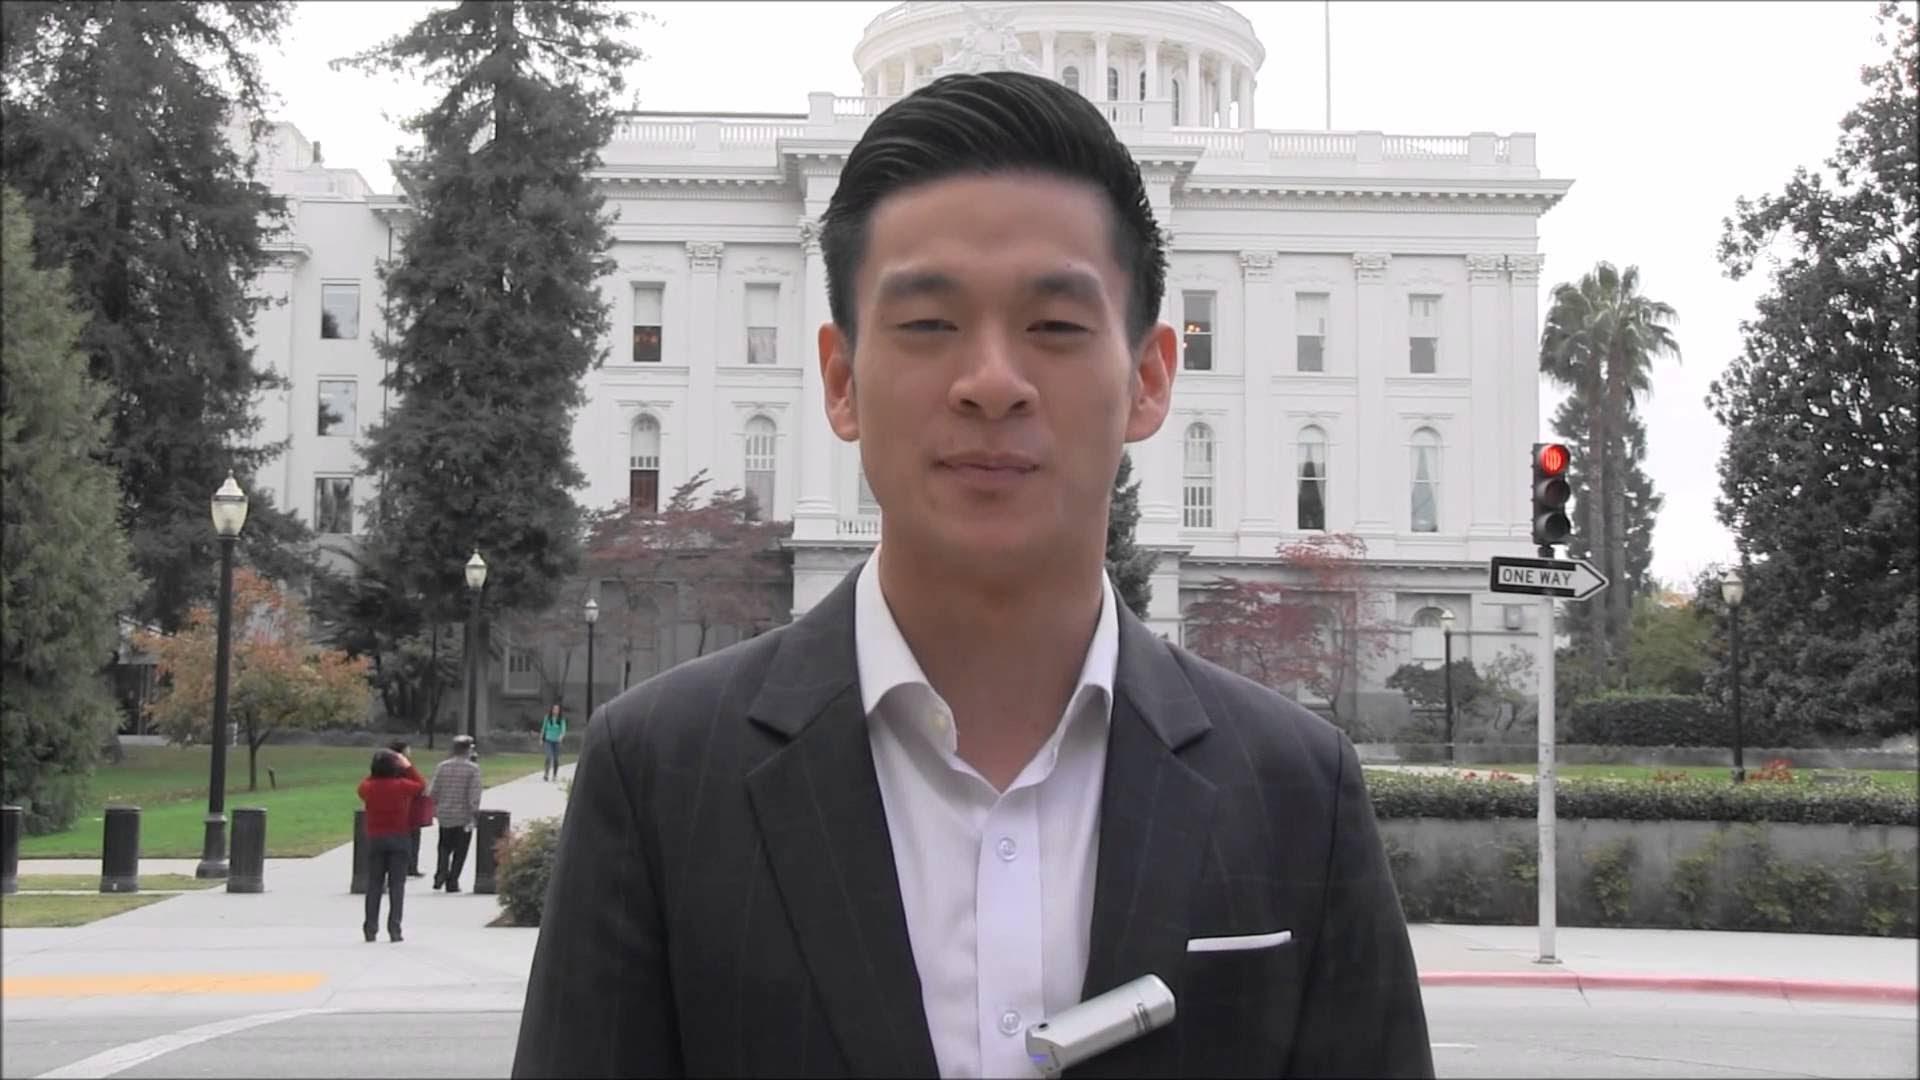 California squelches free speech and politicizes mental health